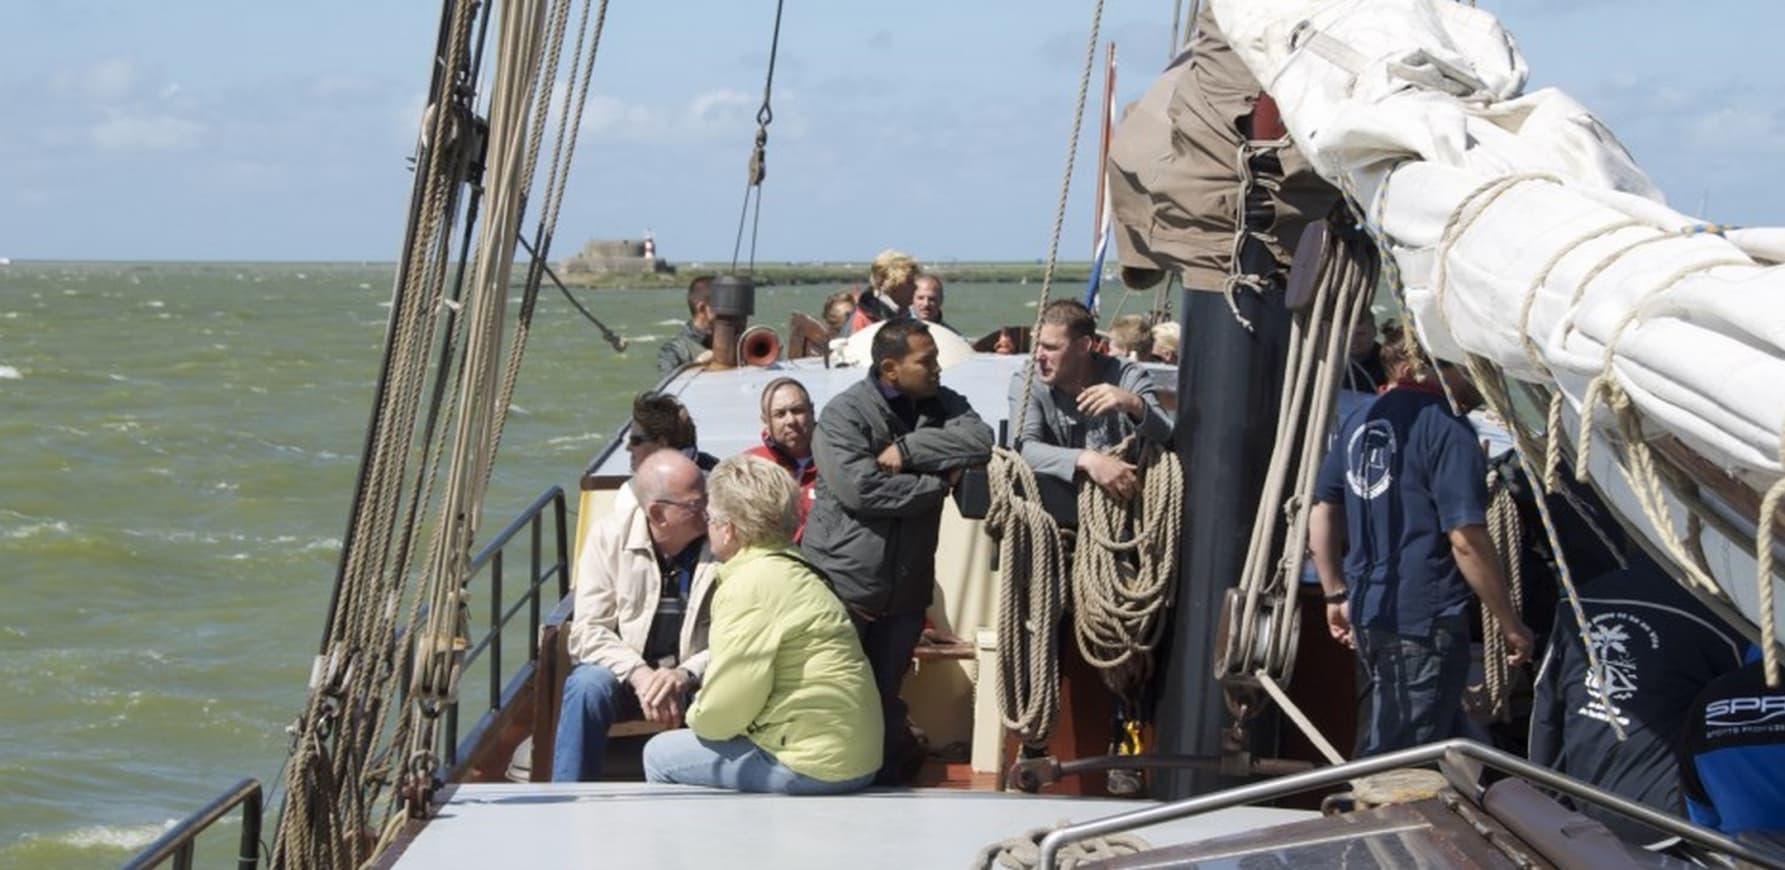 Hotelboot de Vliegende Draeck